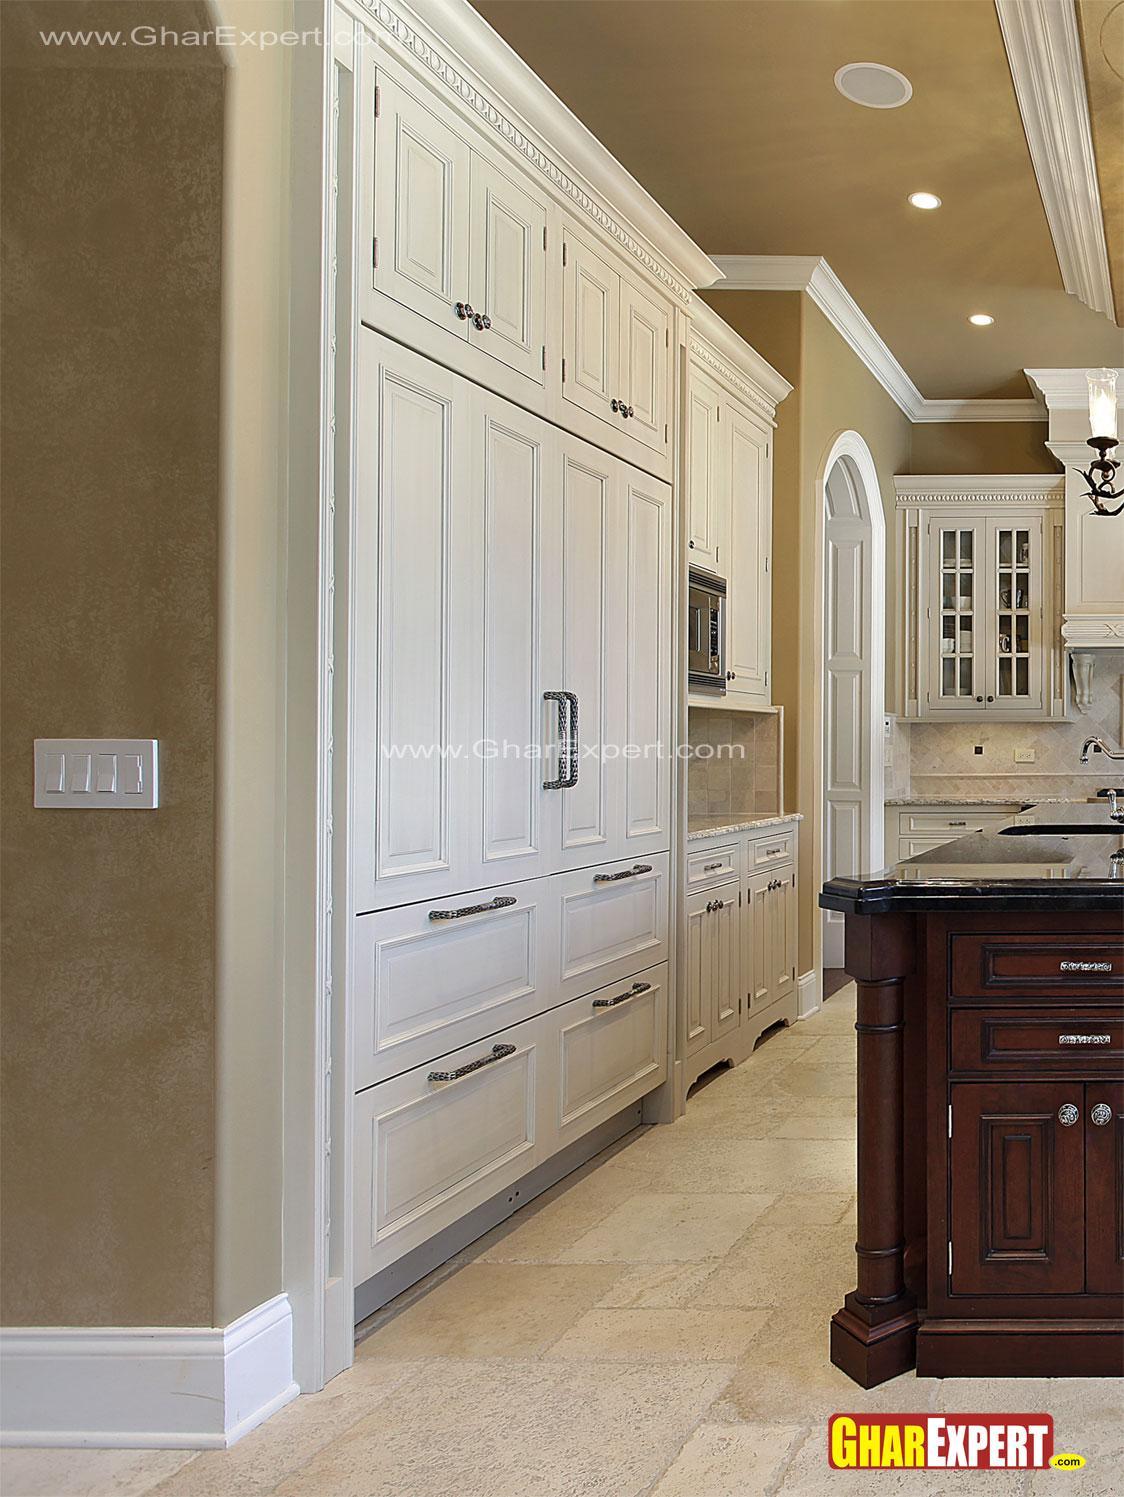 Big kitchen cupboard and cabin....